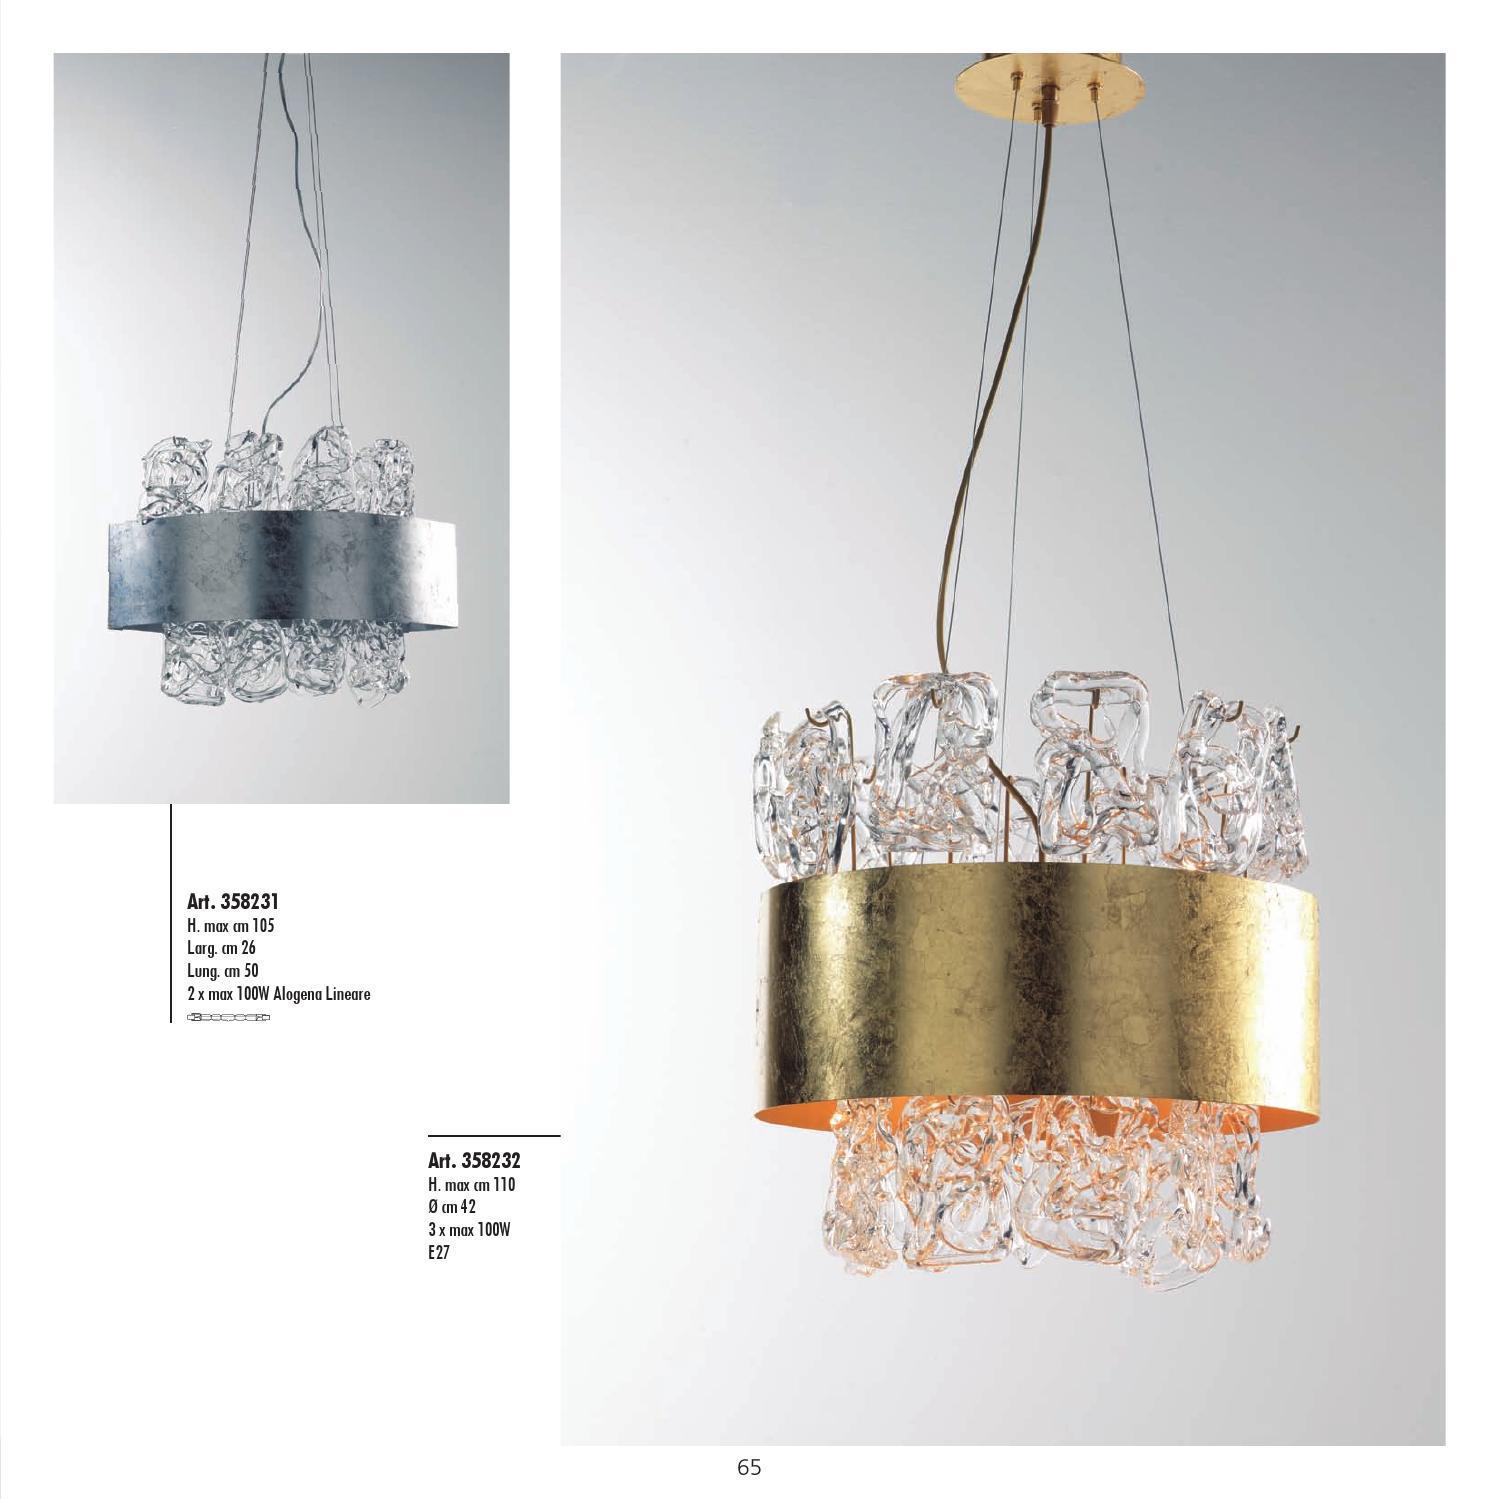 febo 2014年欧美现代灯饰灯具设计素材_1499*1499